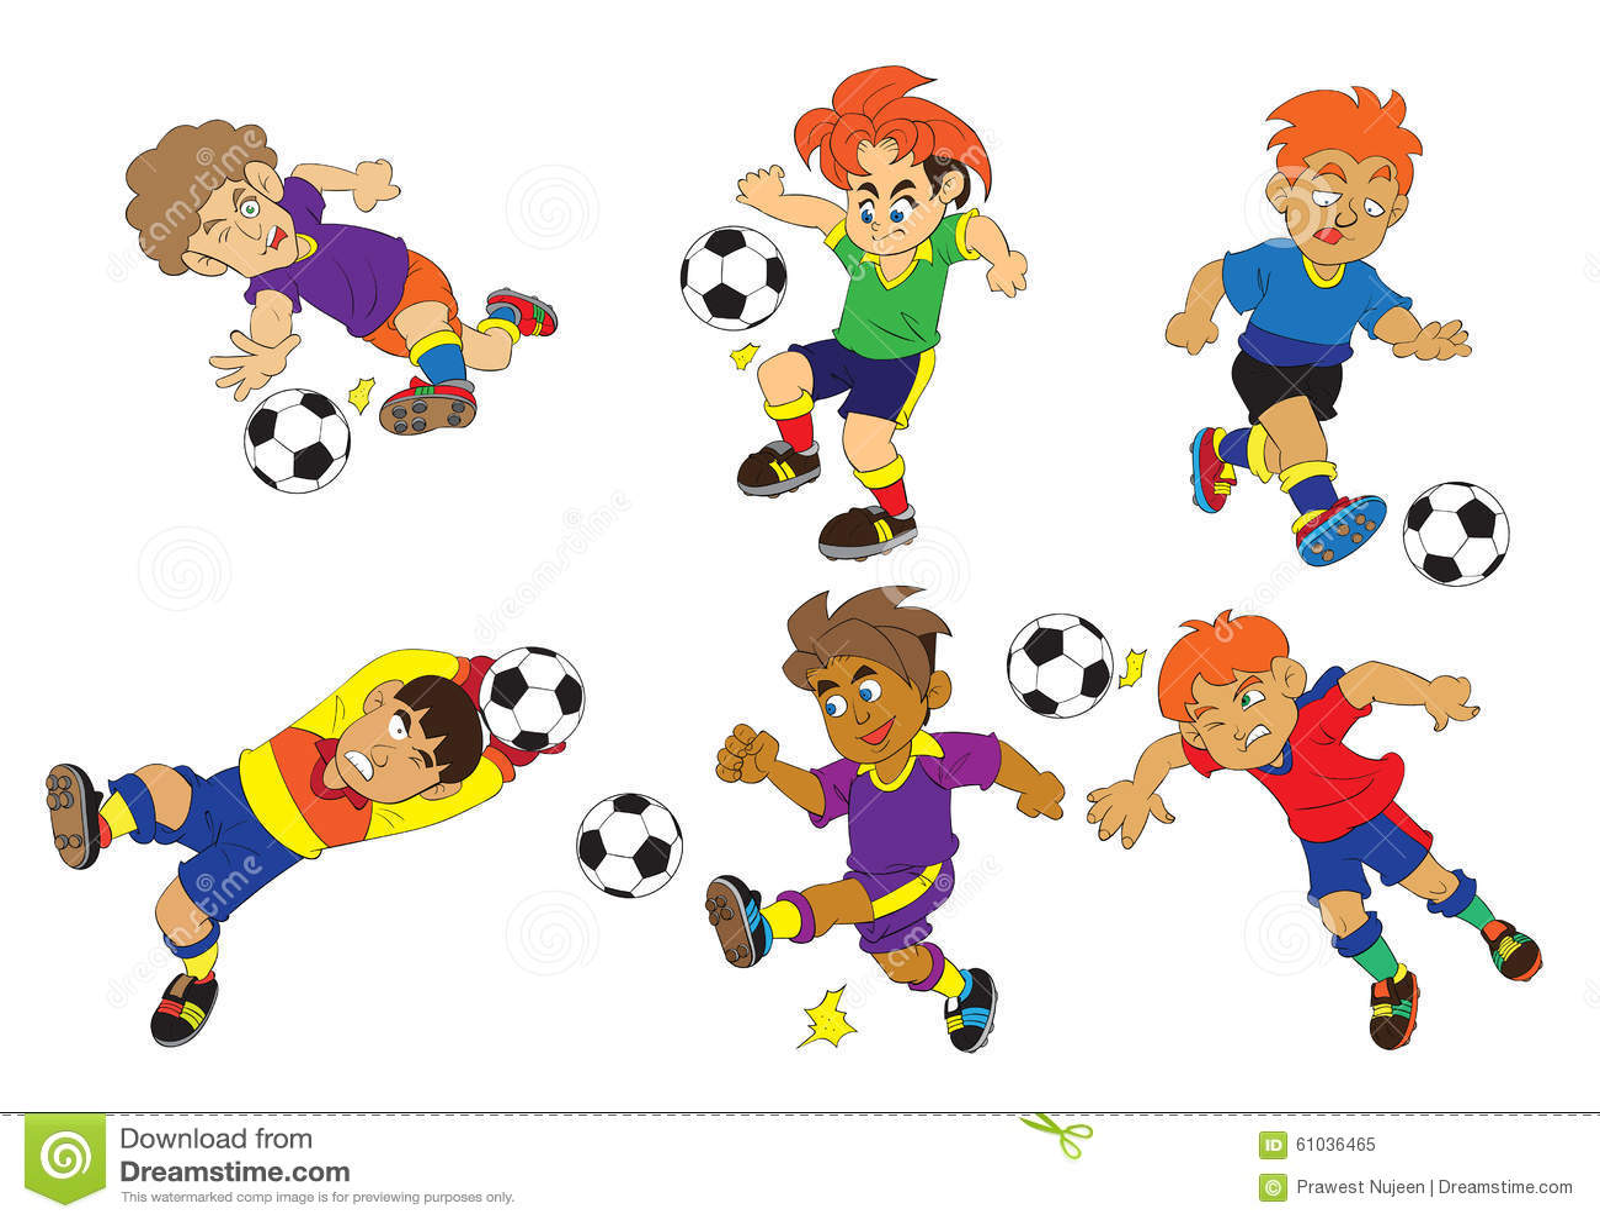 Sport Football Cartoon Vector Stock Vector - Illustration of illustration. people: 61036465